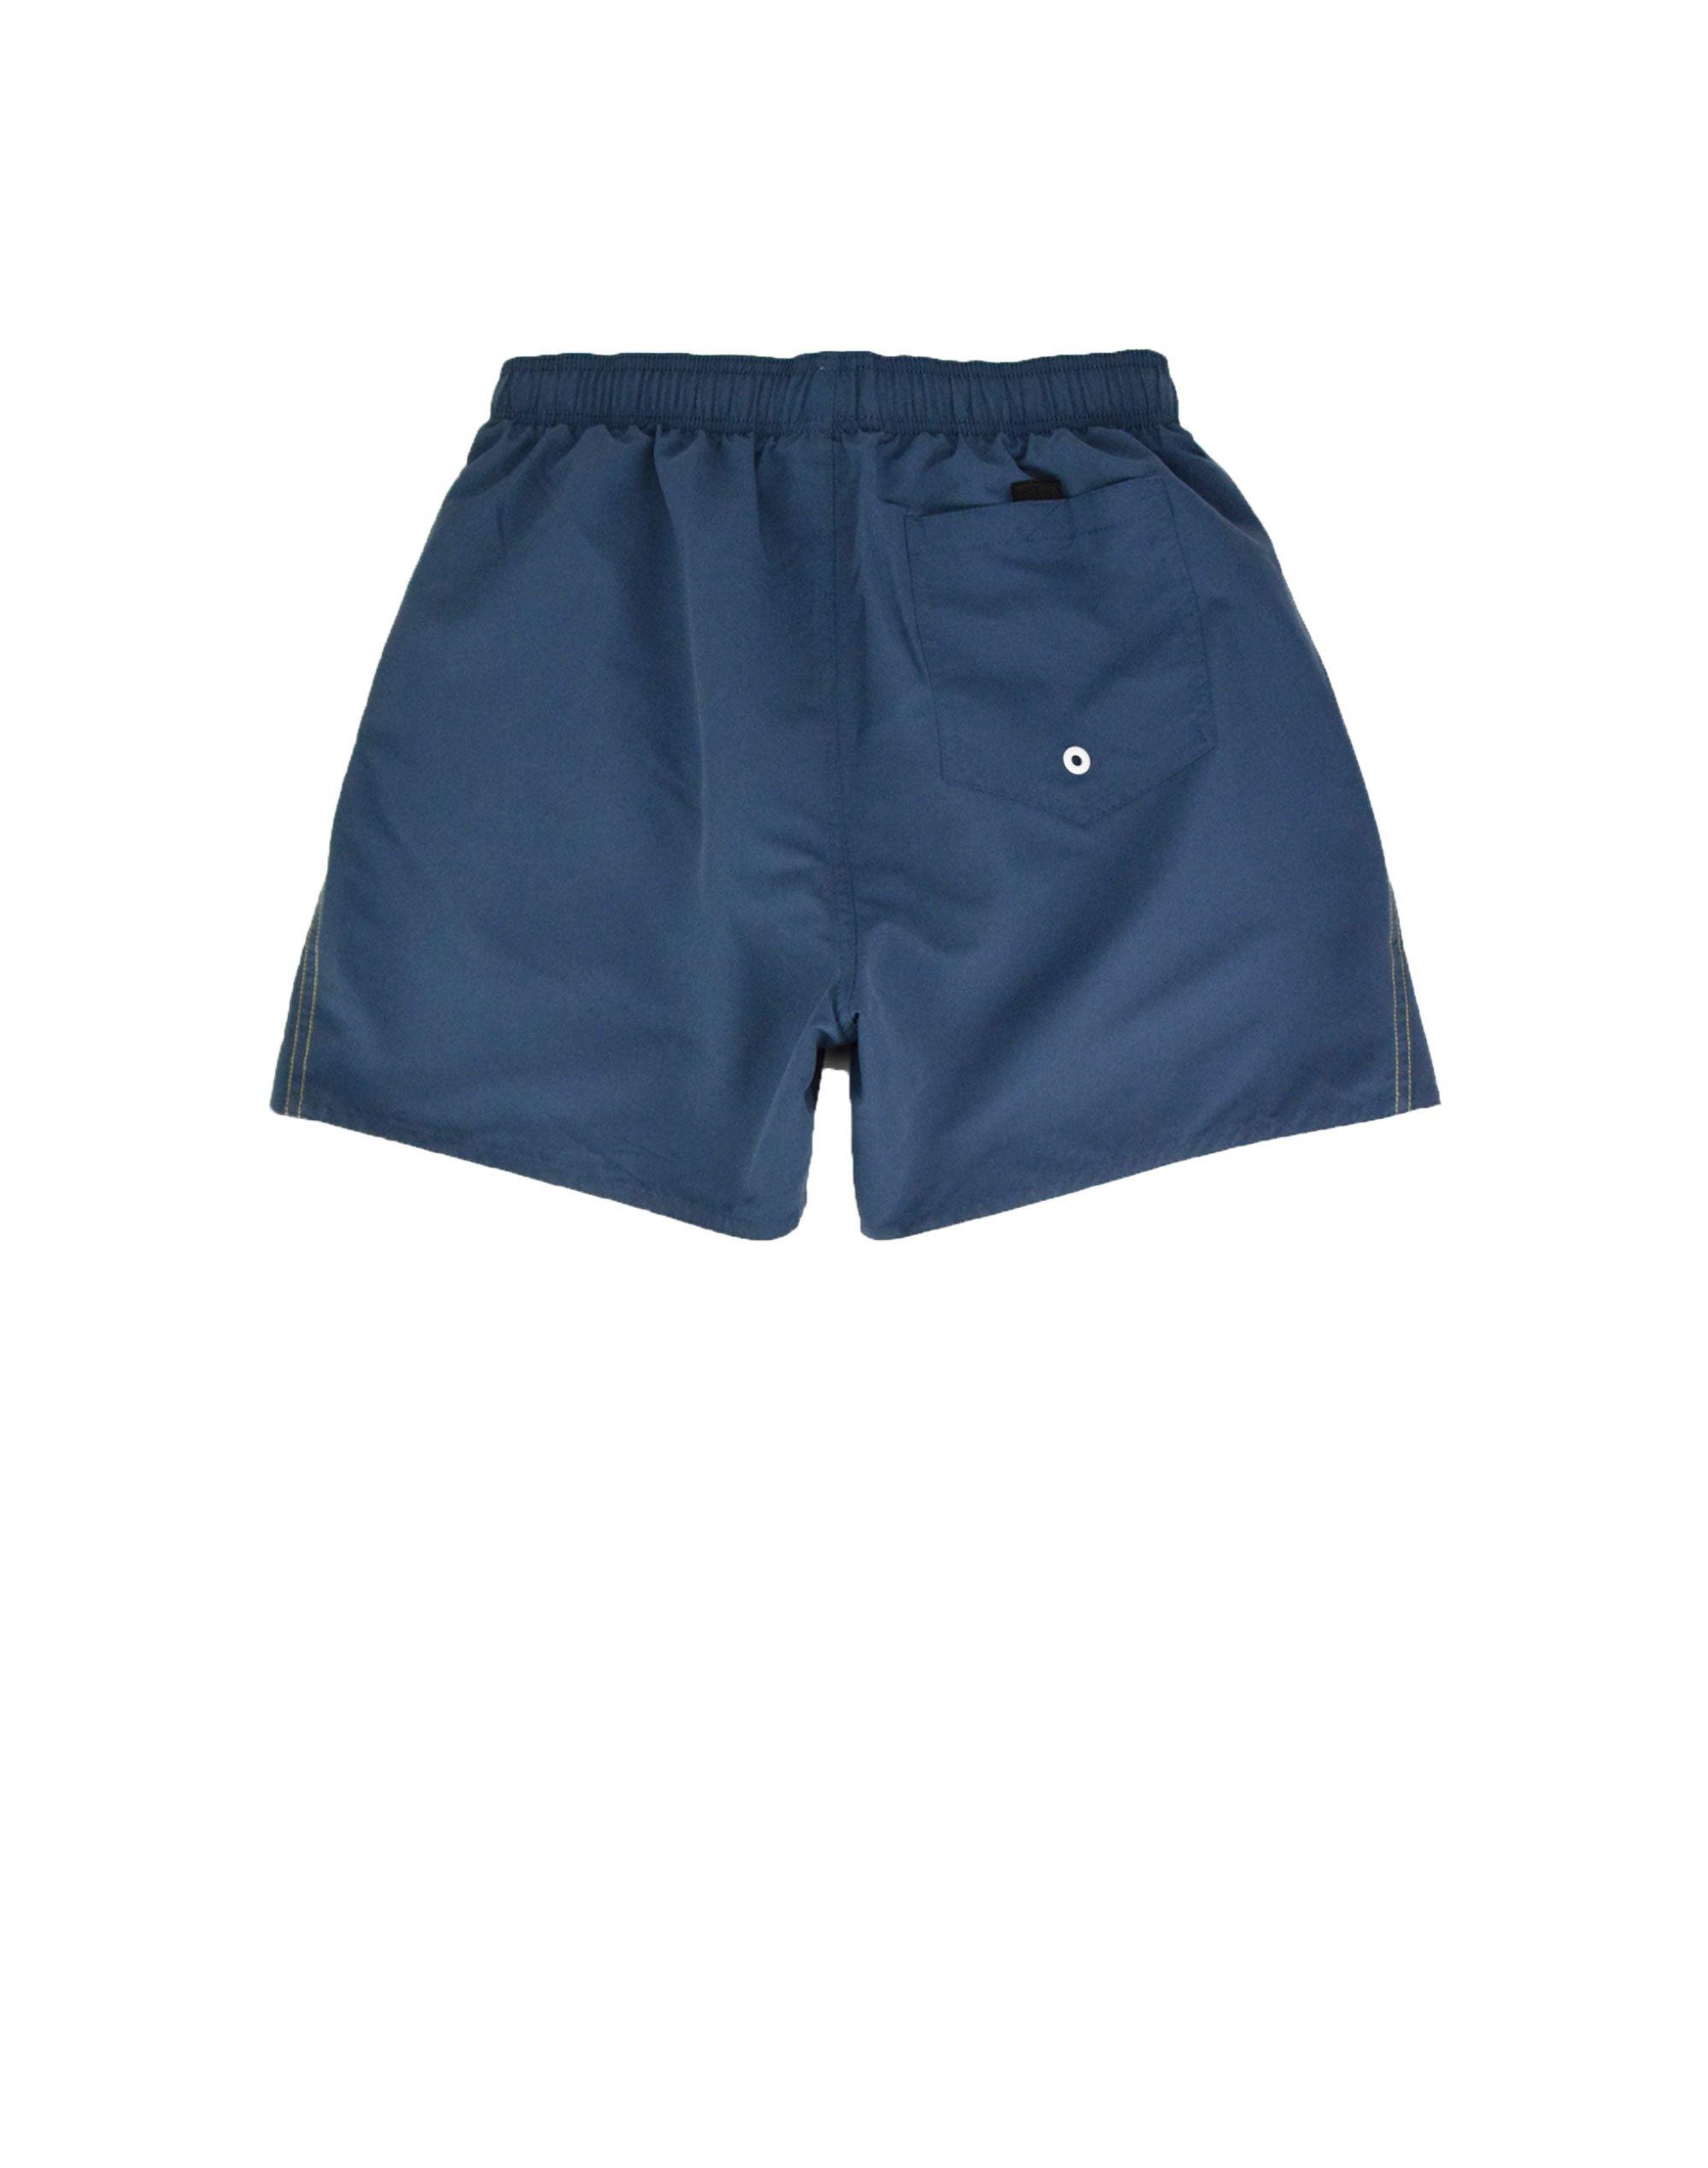 Arena Fundamentals Boxer -Short (1B328550) Shark/Yellow Star